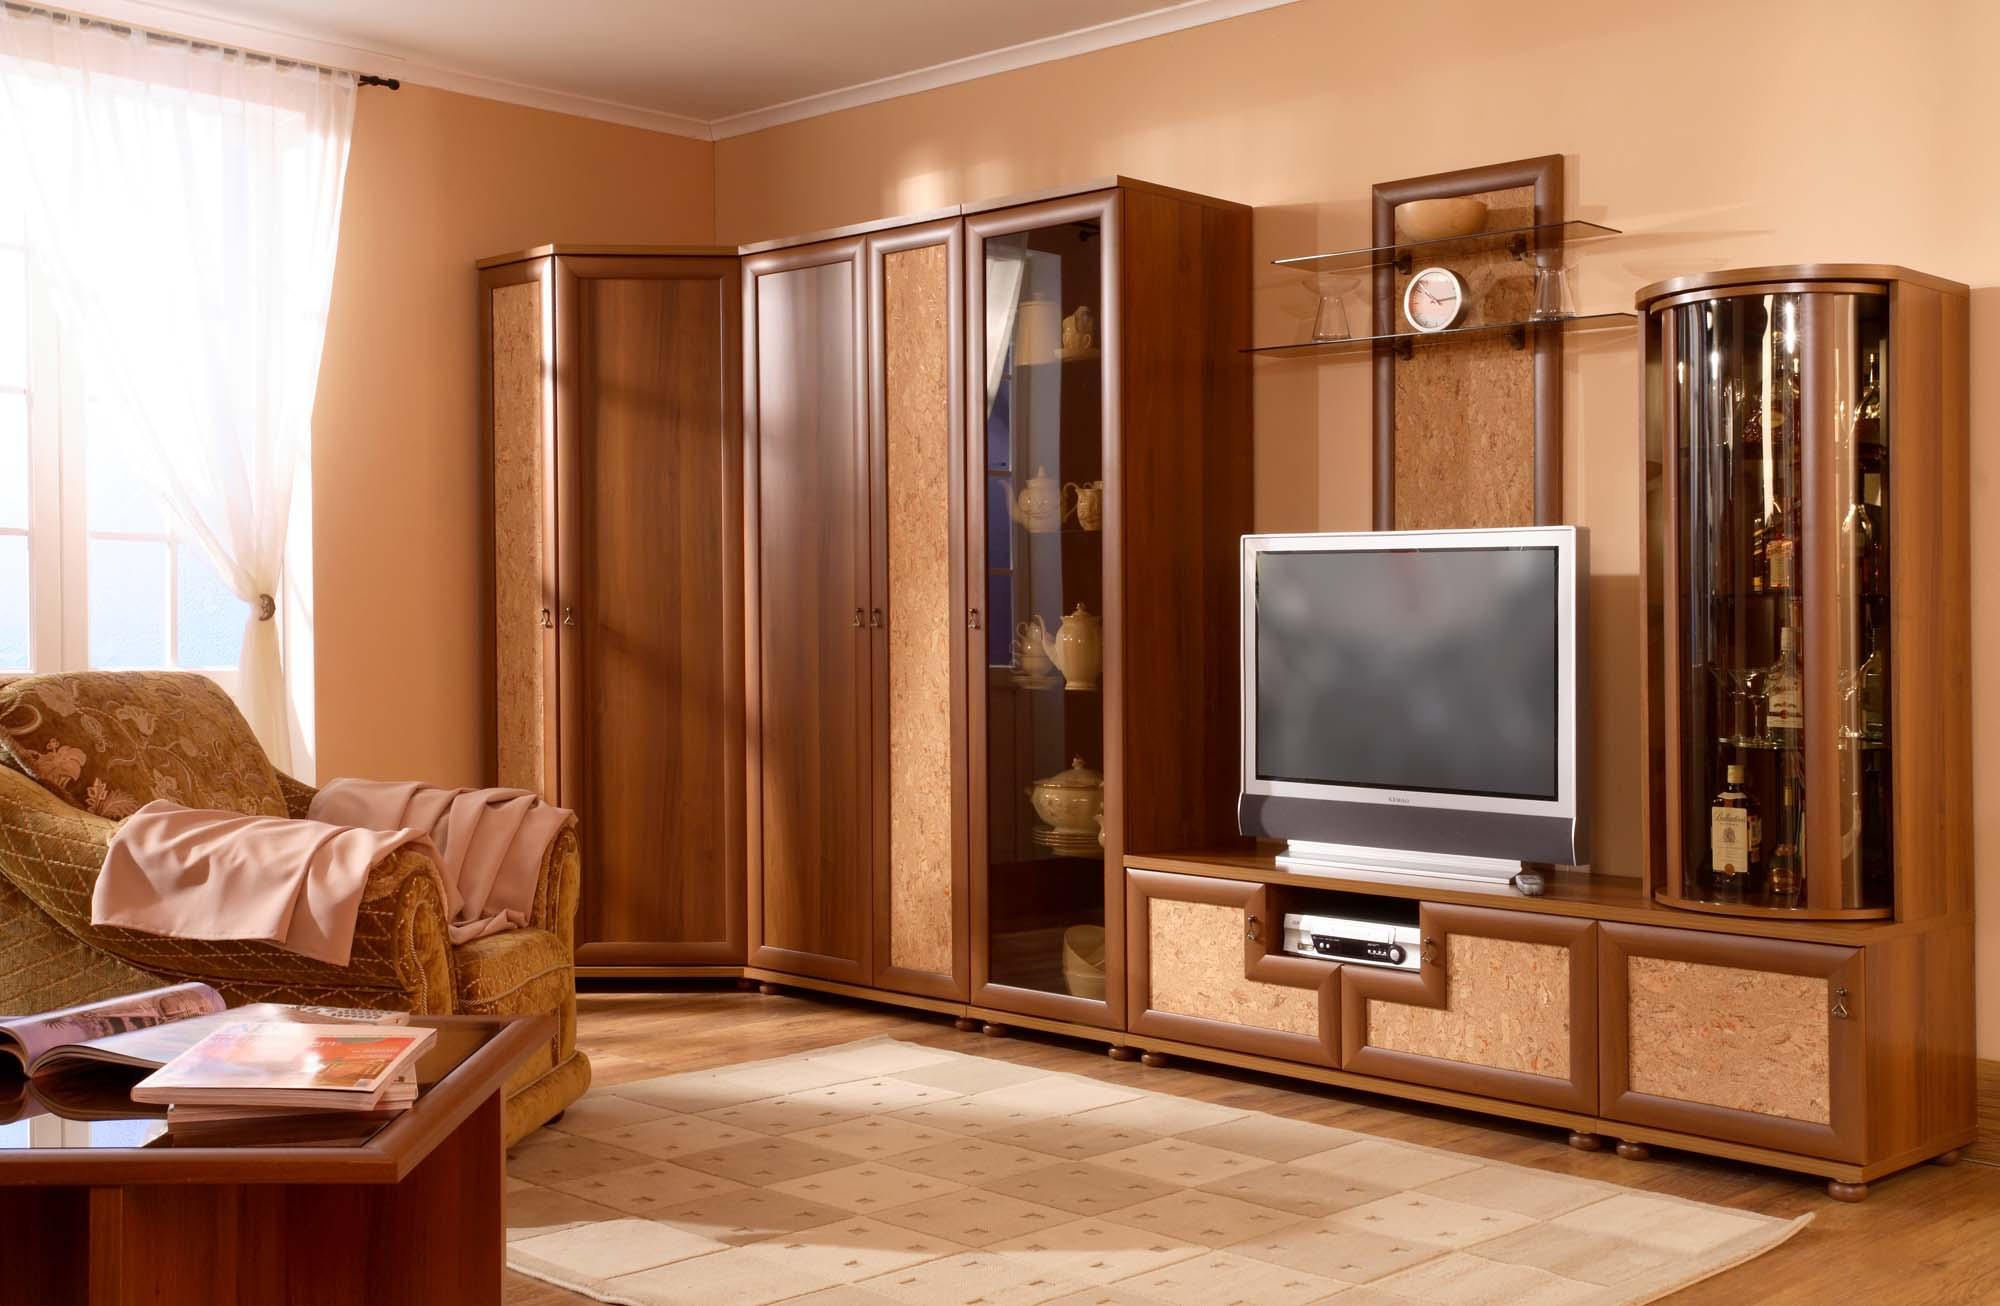 Вул. Чистопольська, 72 (погодинна оренда) - 2-кімнатна кварт.